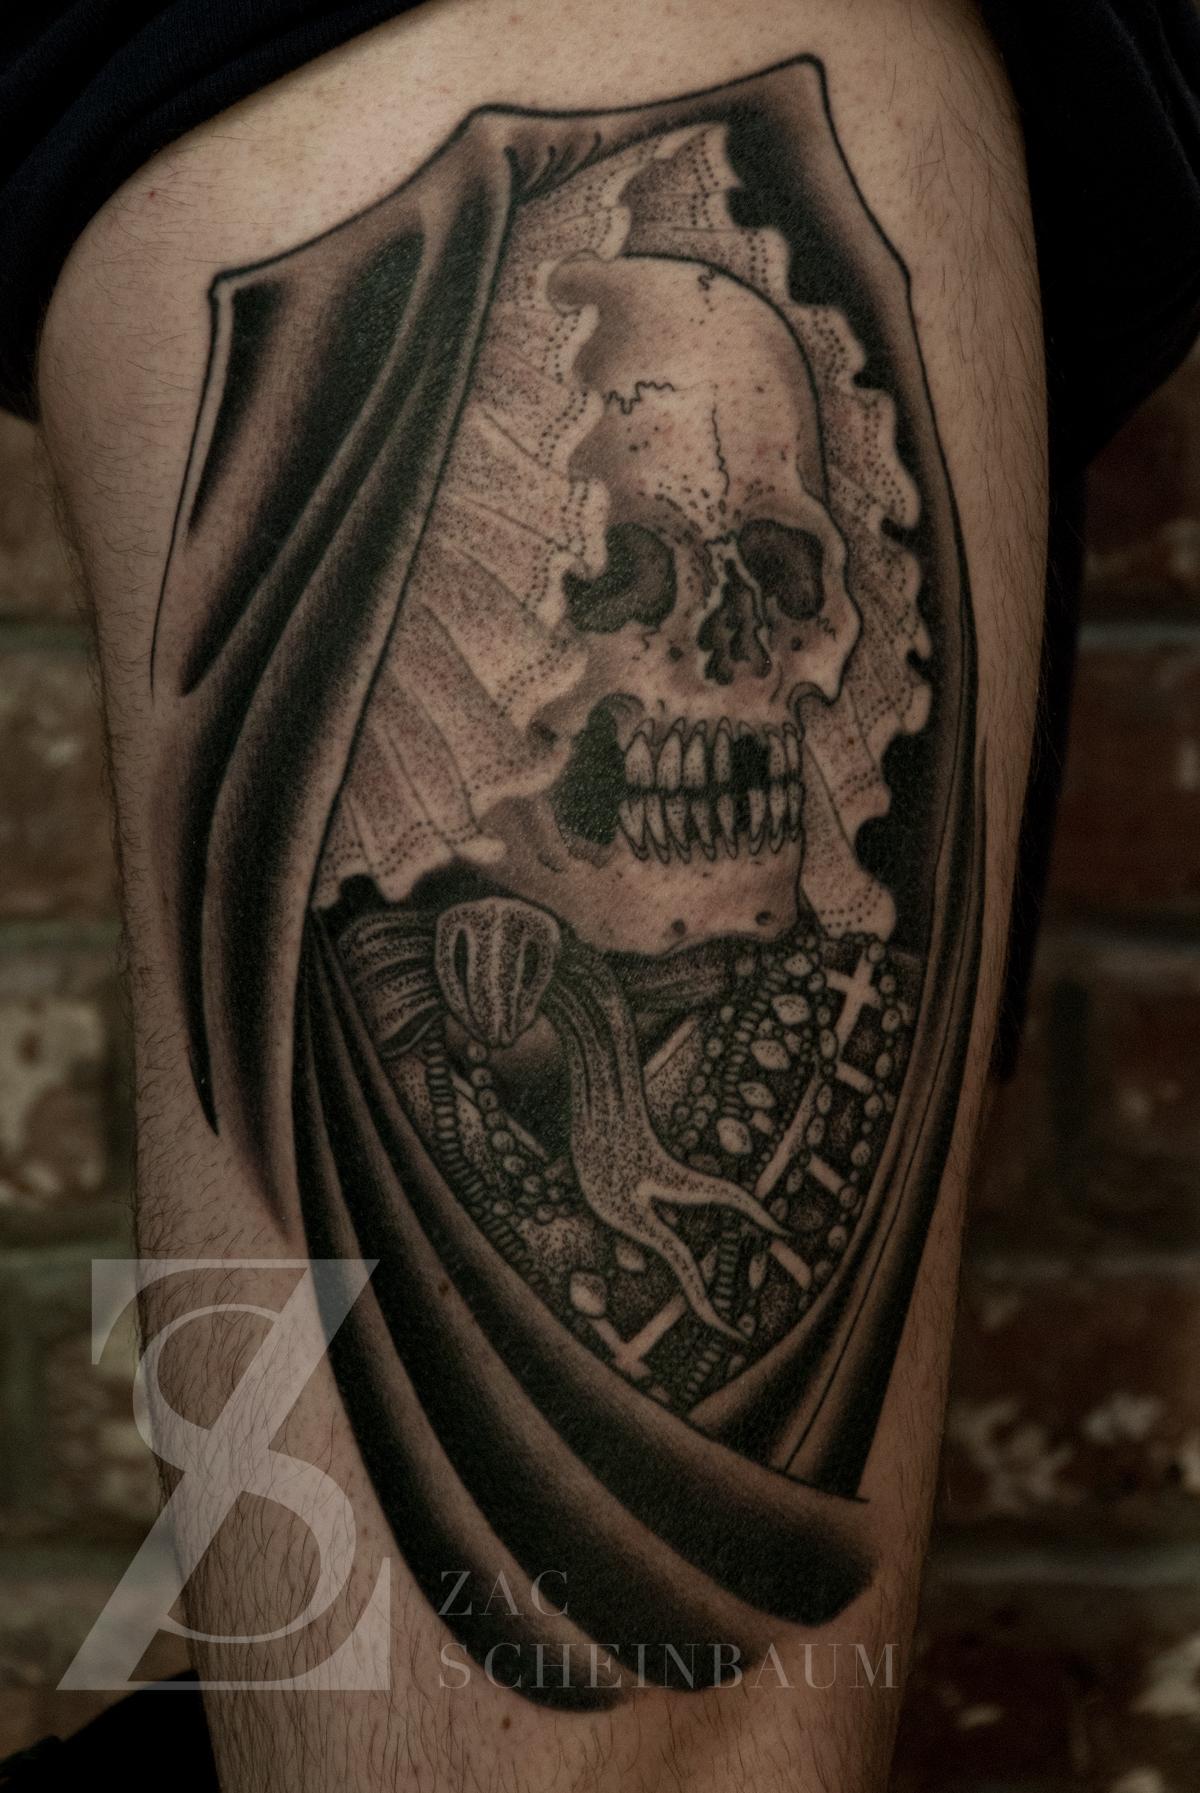 zac-scheinbaum-saved-tattoo-cody-2012-2012-1.jpg